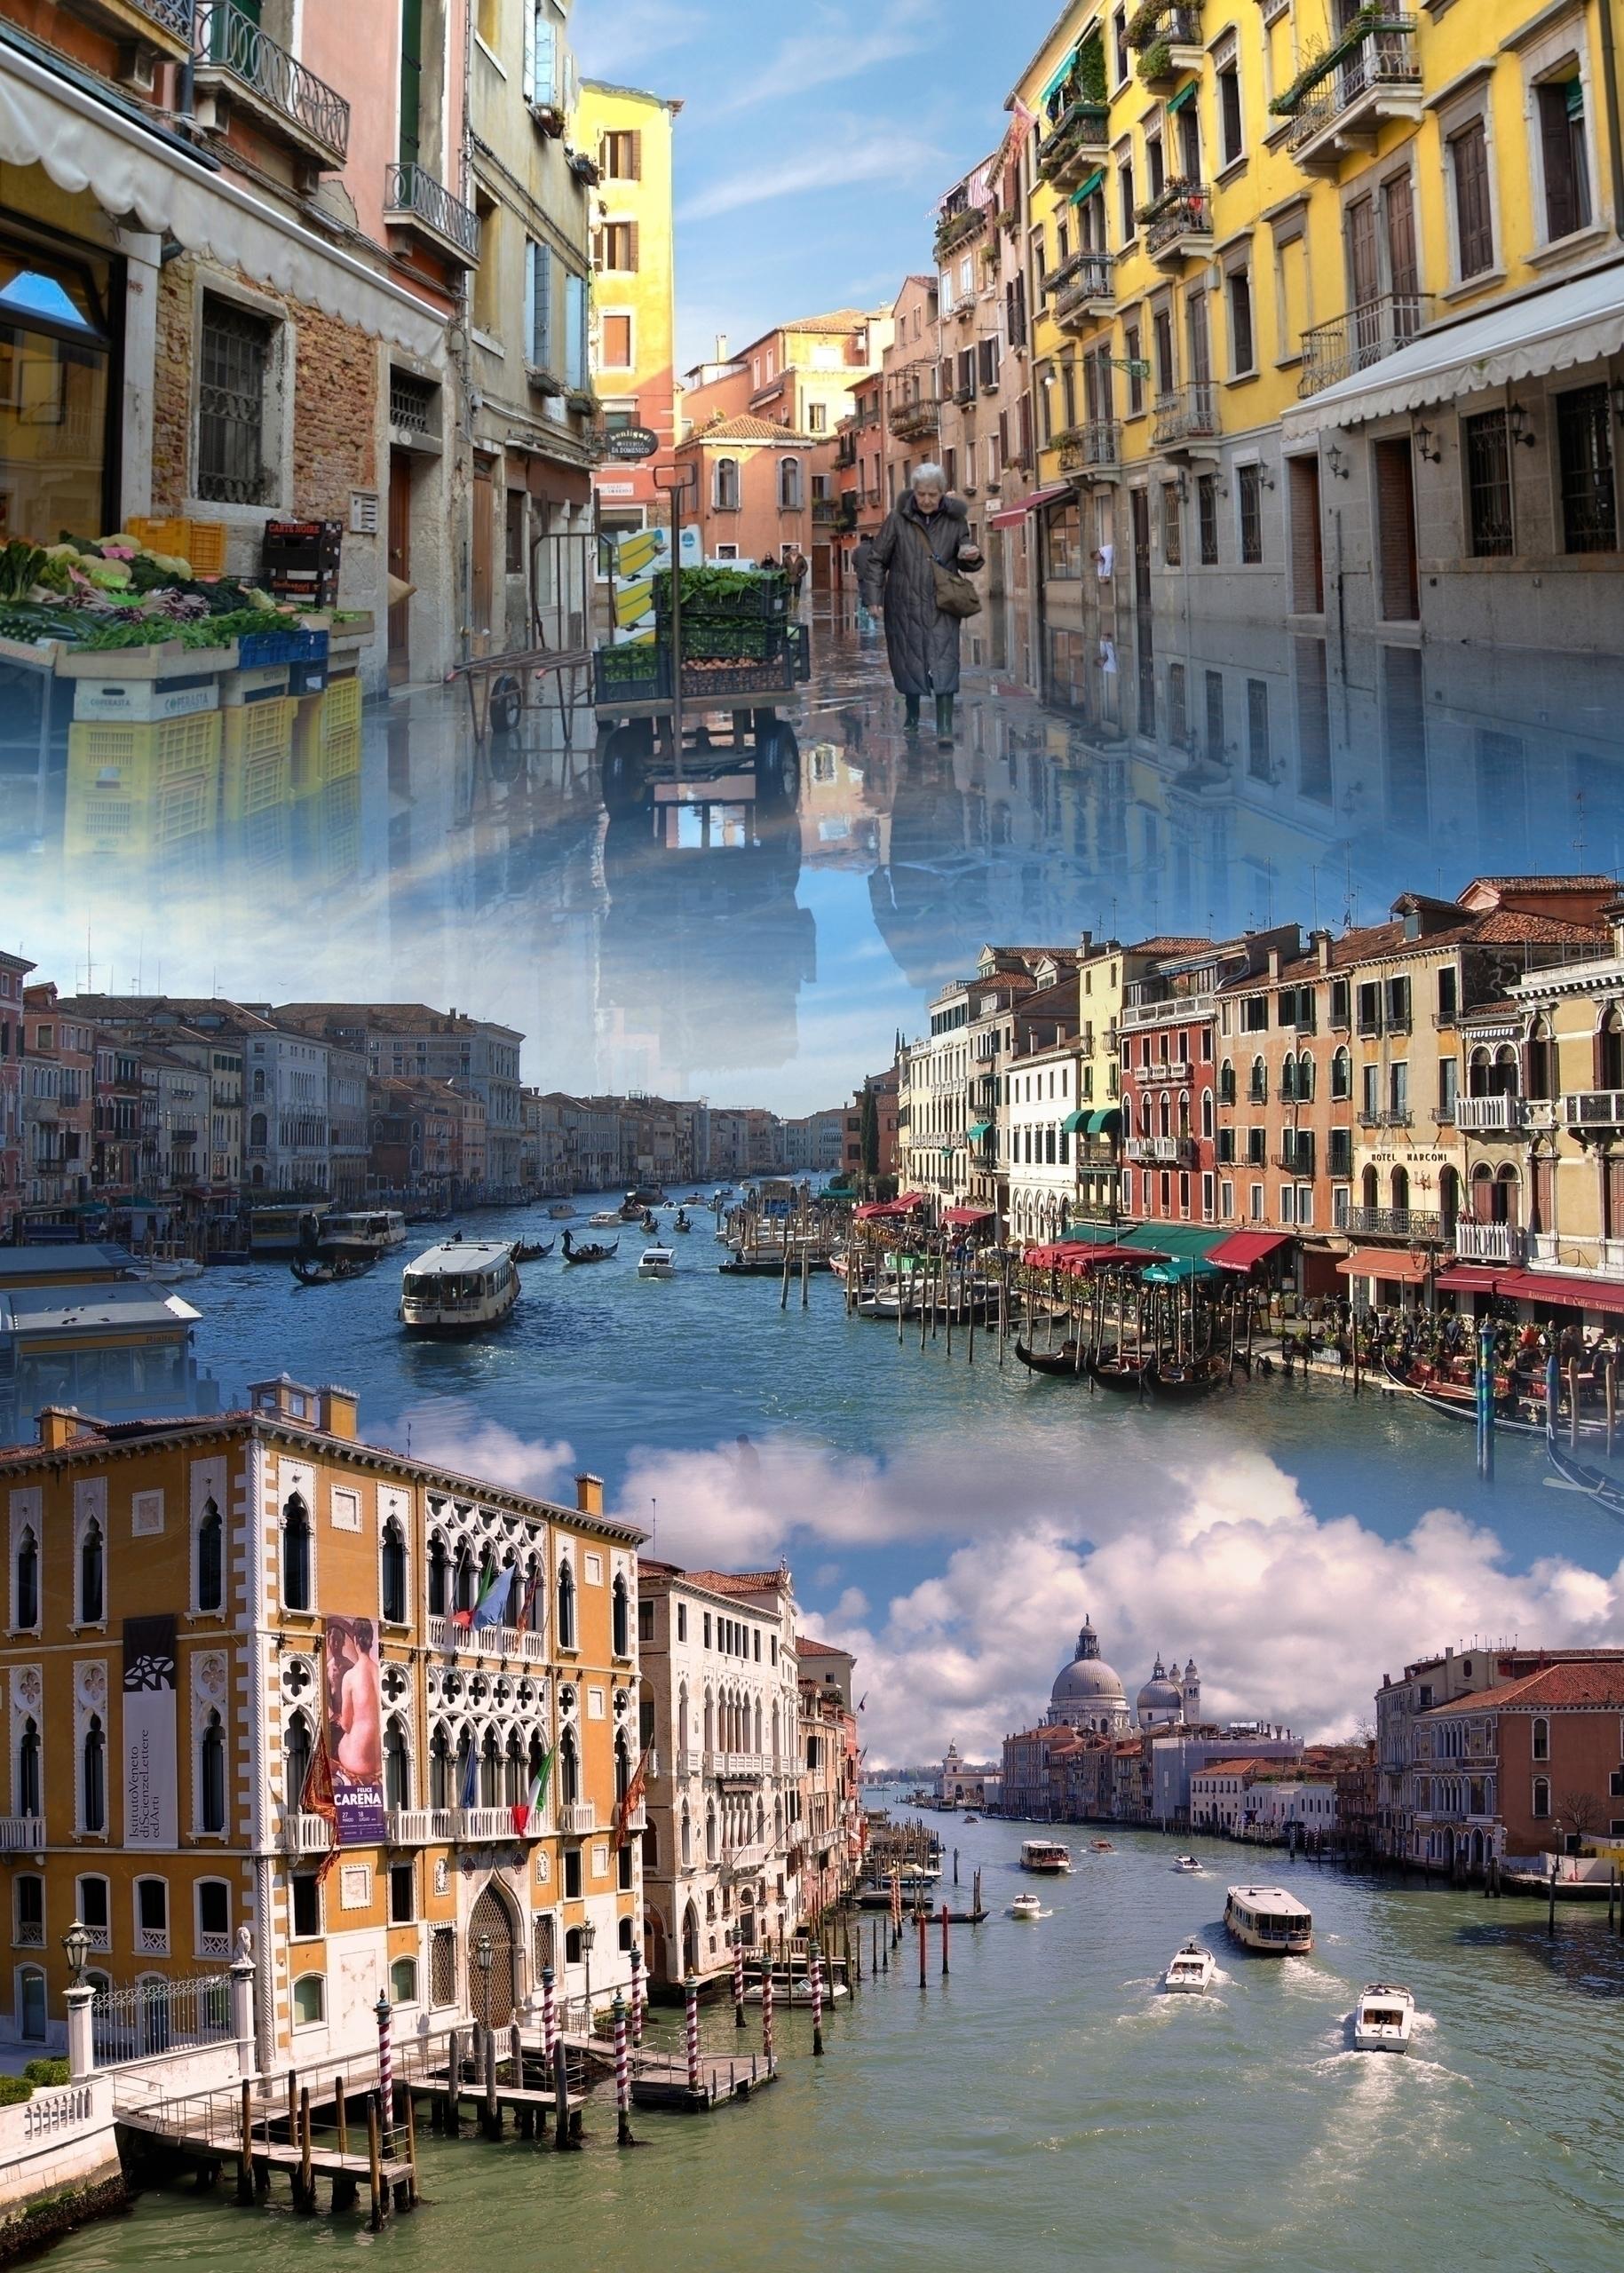 Shades Venice - multipleexposure - simplycomplicatedphotography   ello